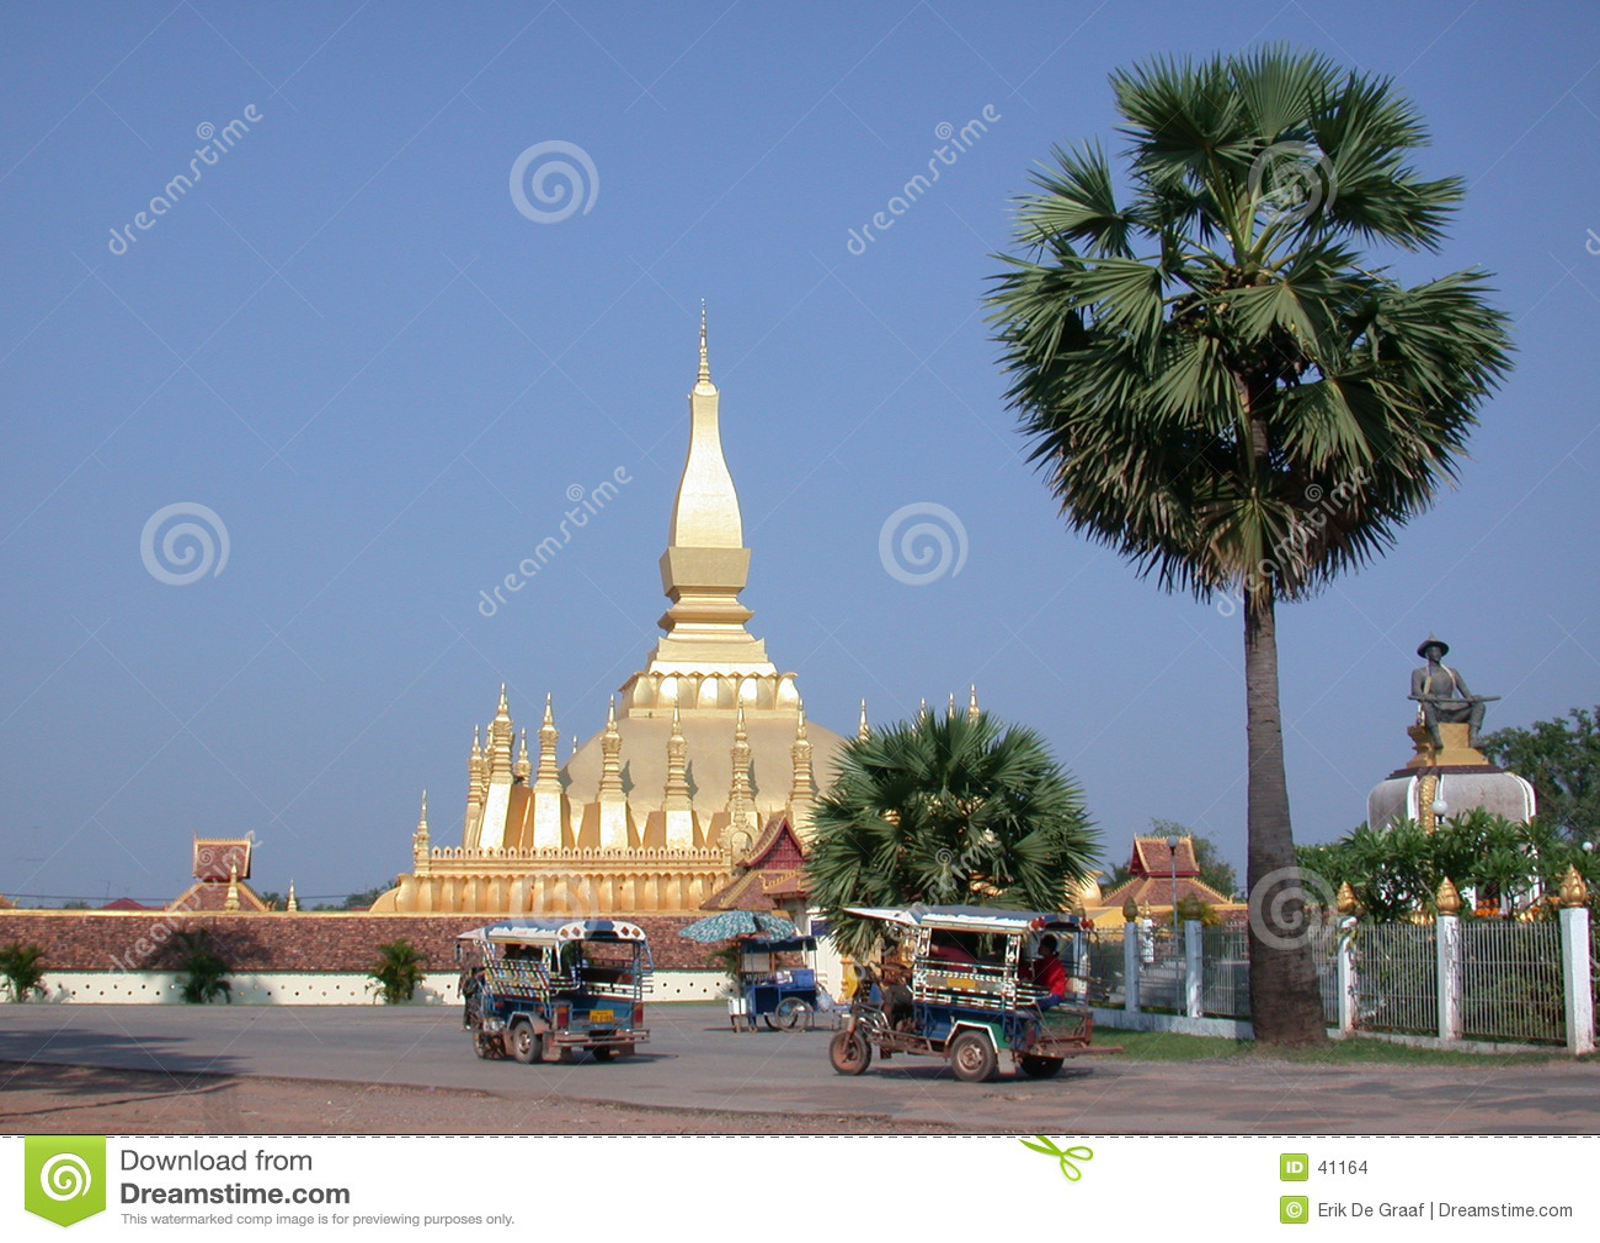 Laos stupa 2